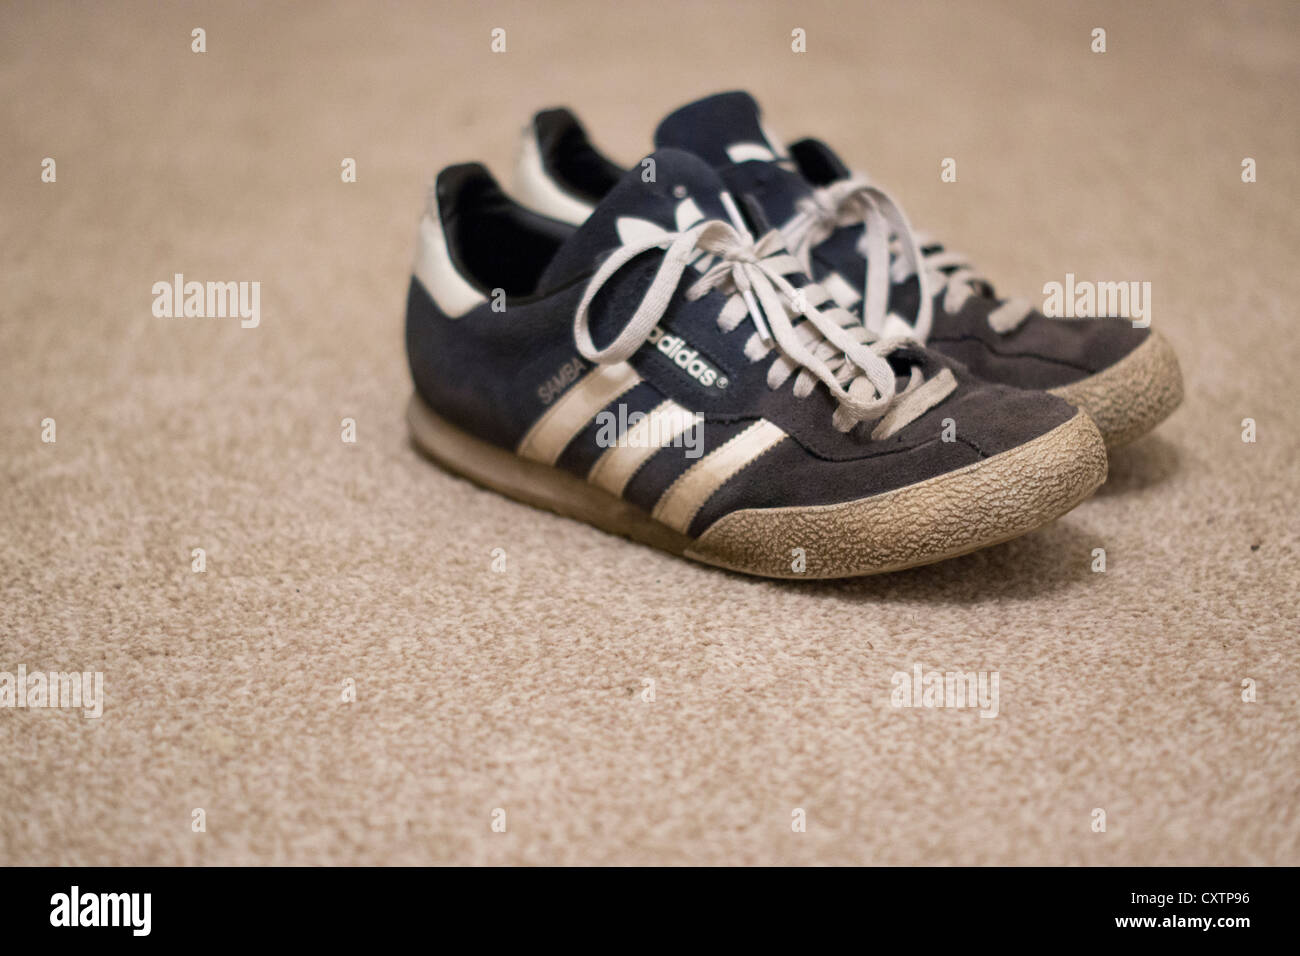 Old Adidas blue Samba trainers Stock Photo - Alamy